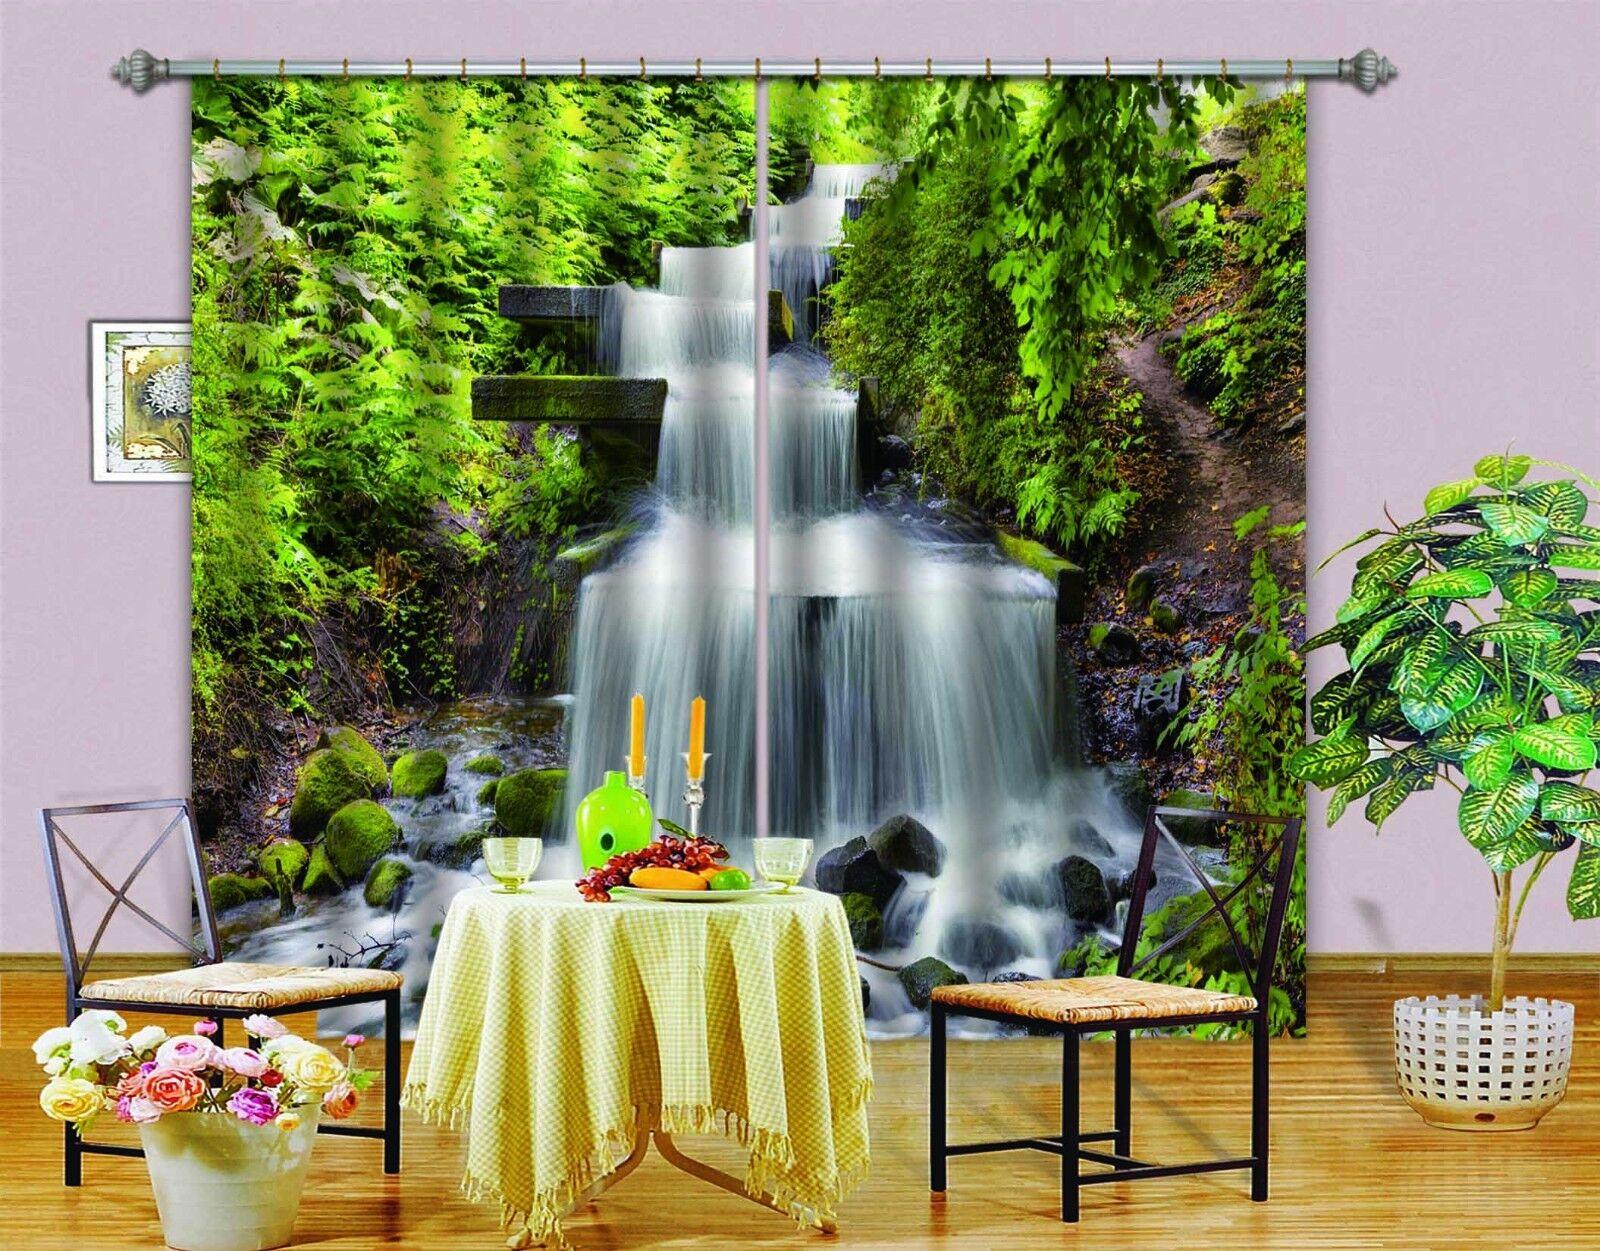 Hierba de río 3D 0399 Cortinas de impresión de cortina de foto Blockout Tela Cortinas Ventana Reino Unido